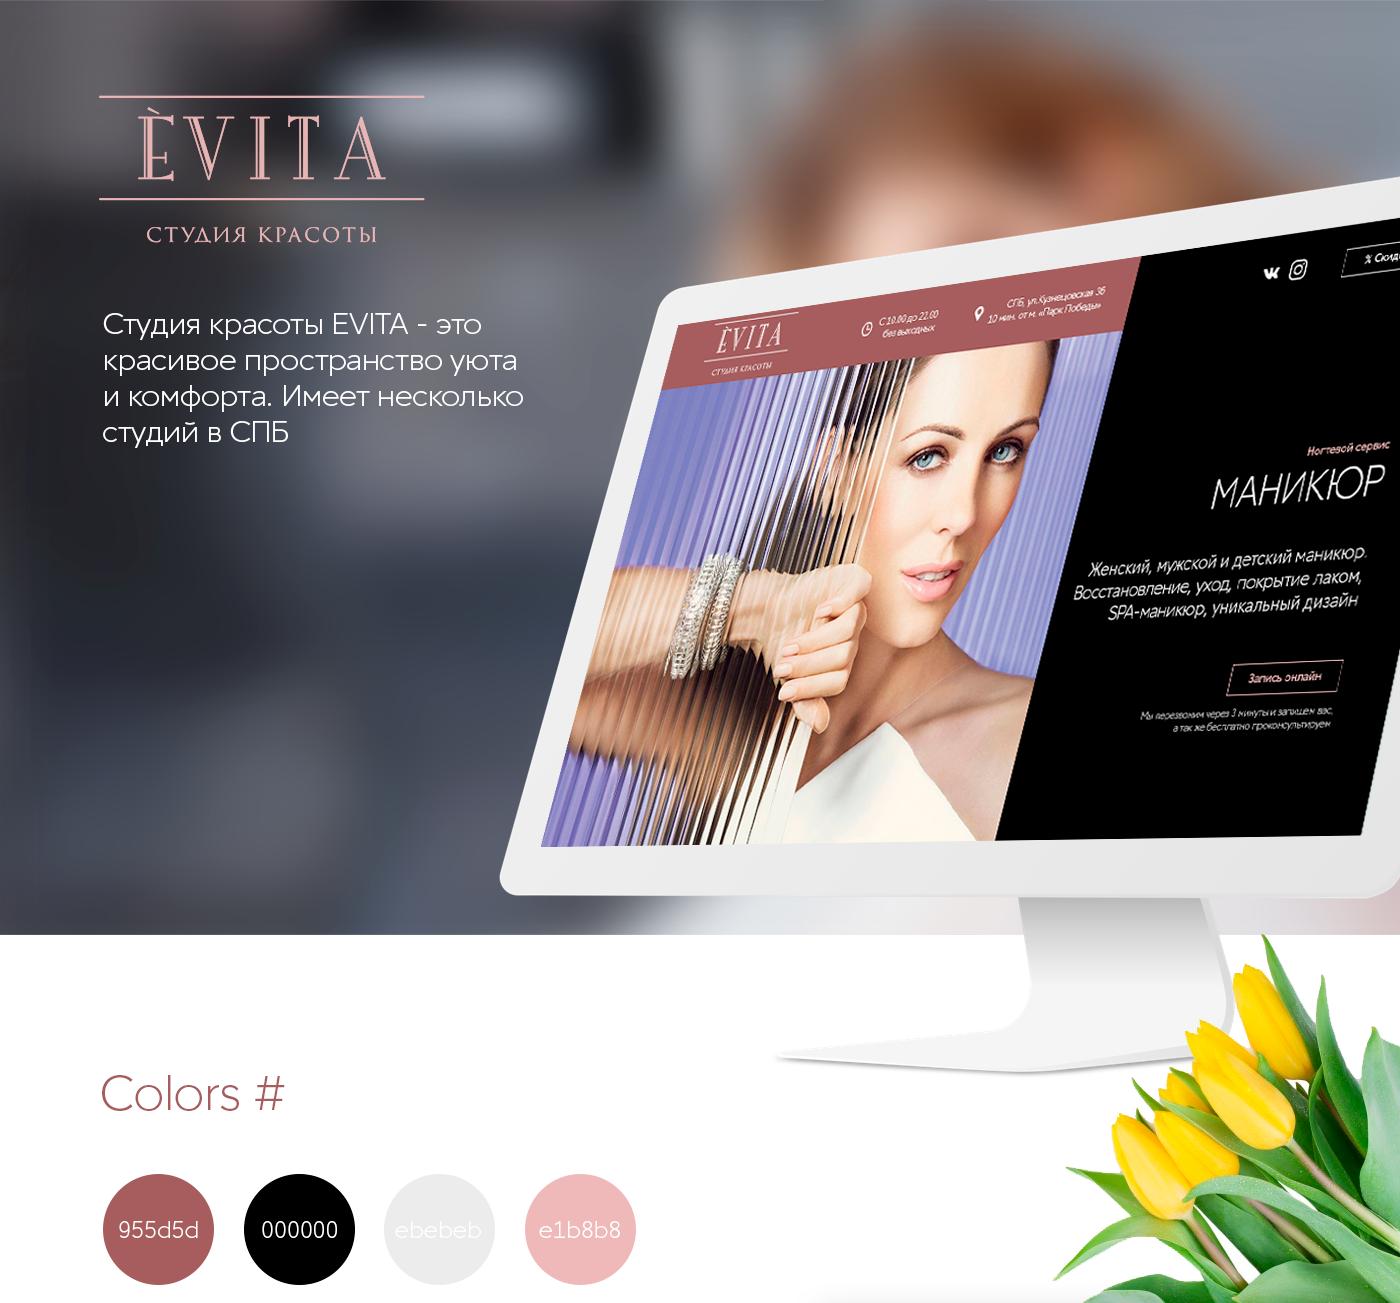 ЭВИТА студия красоты - дизайн Landing Page